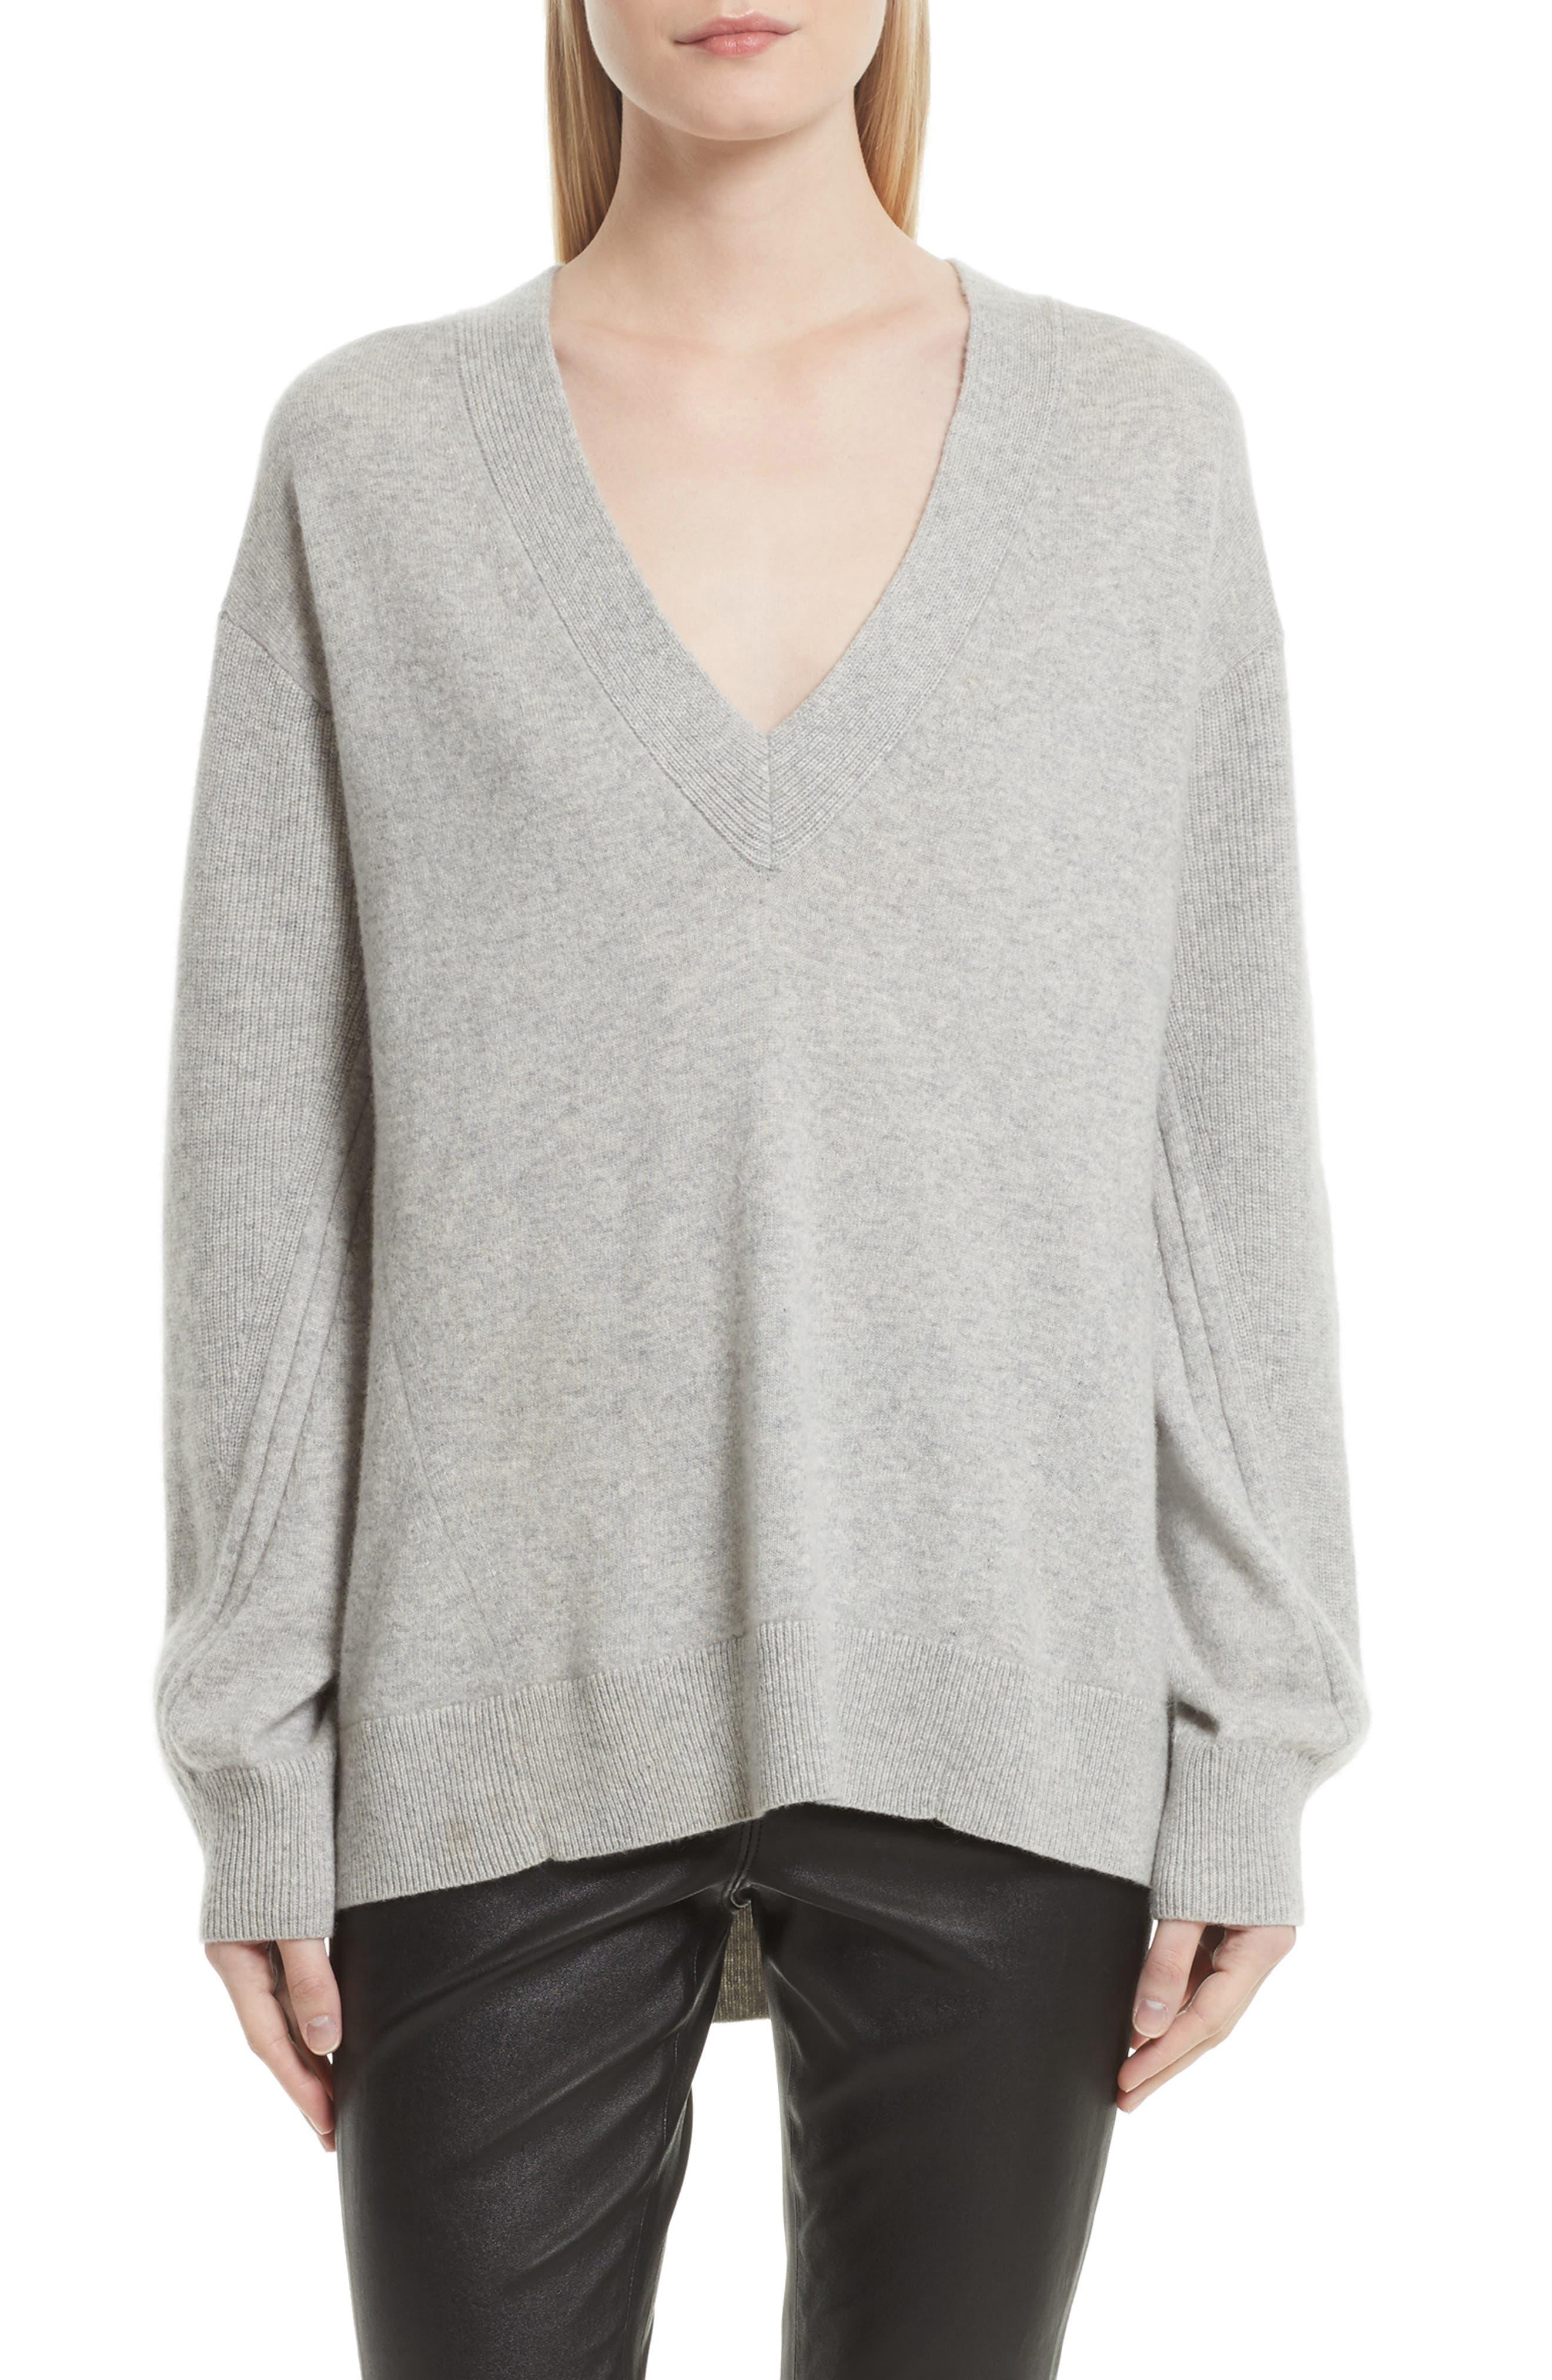 Ace Cashmere Sweater,                             Main thumbnail 1, color,                             058